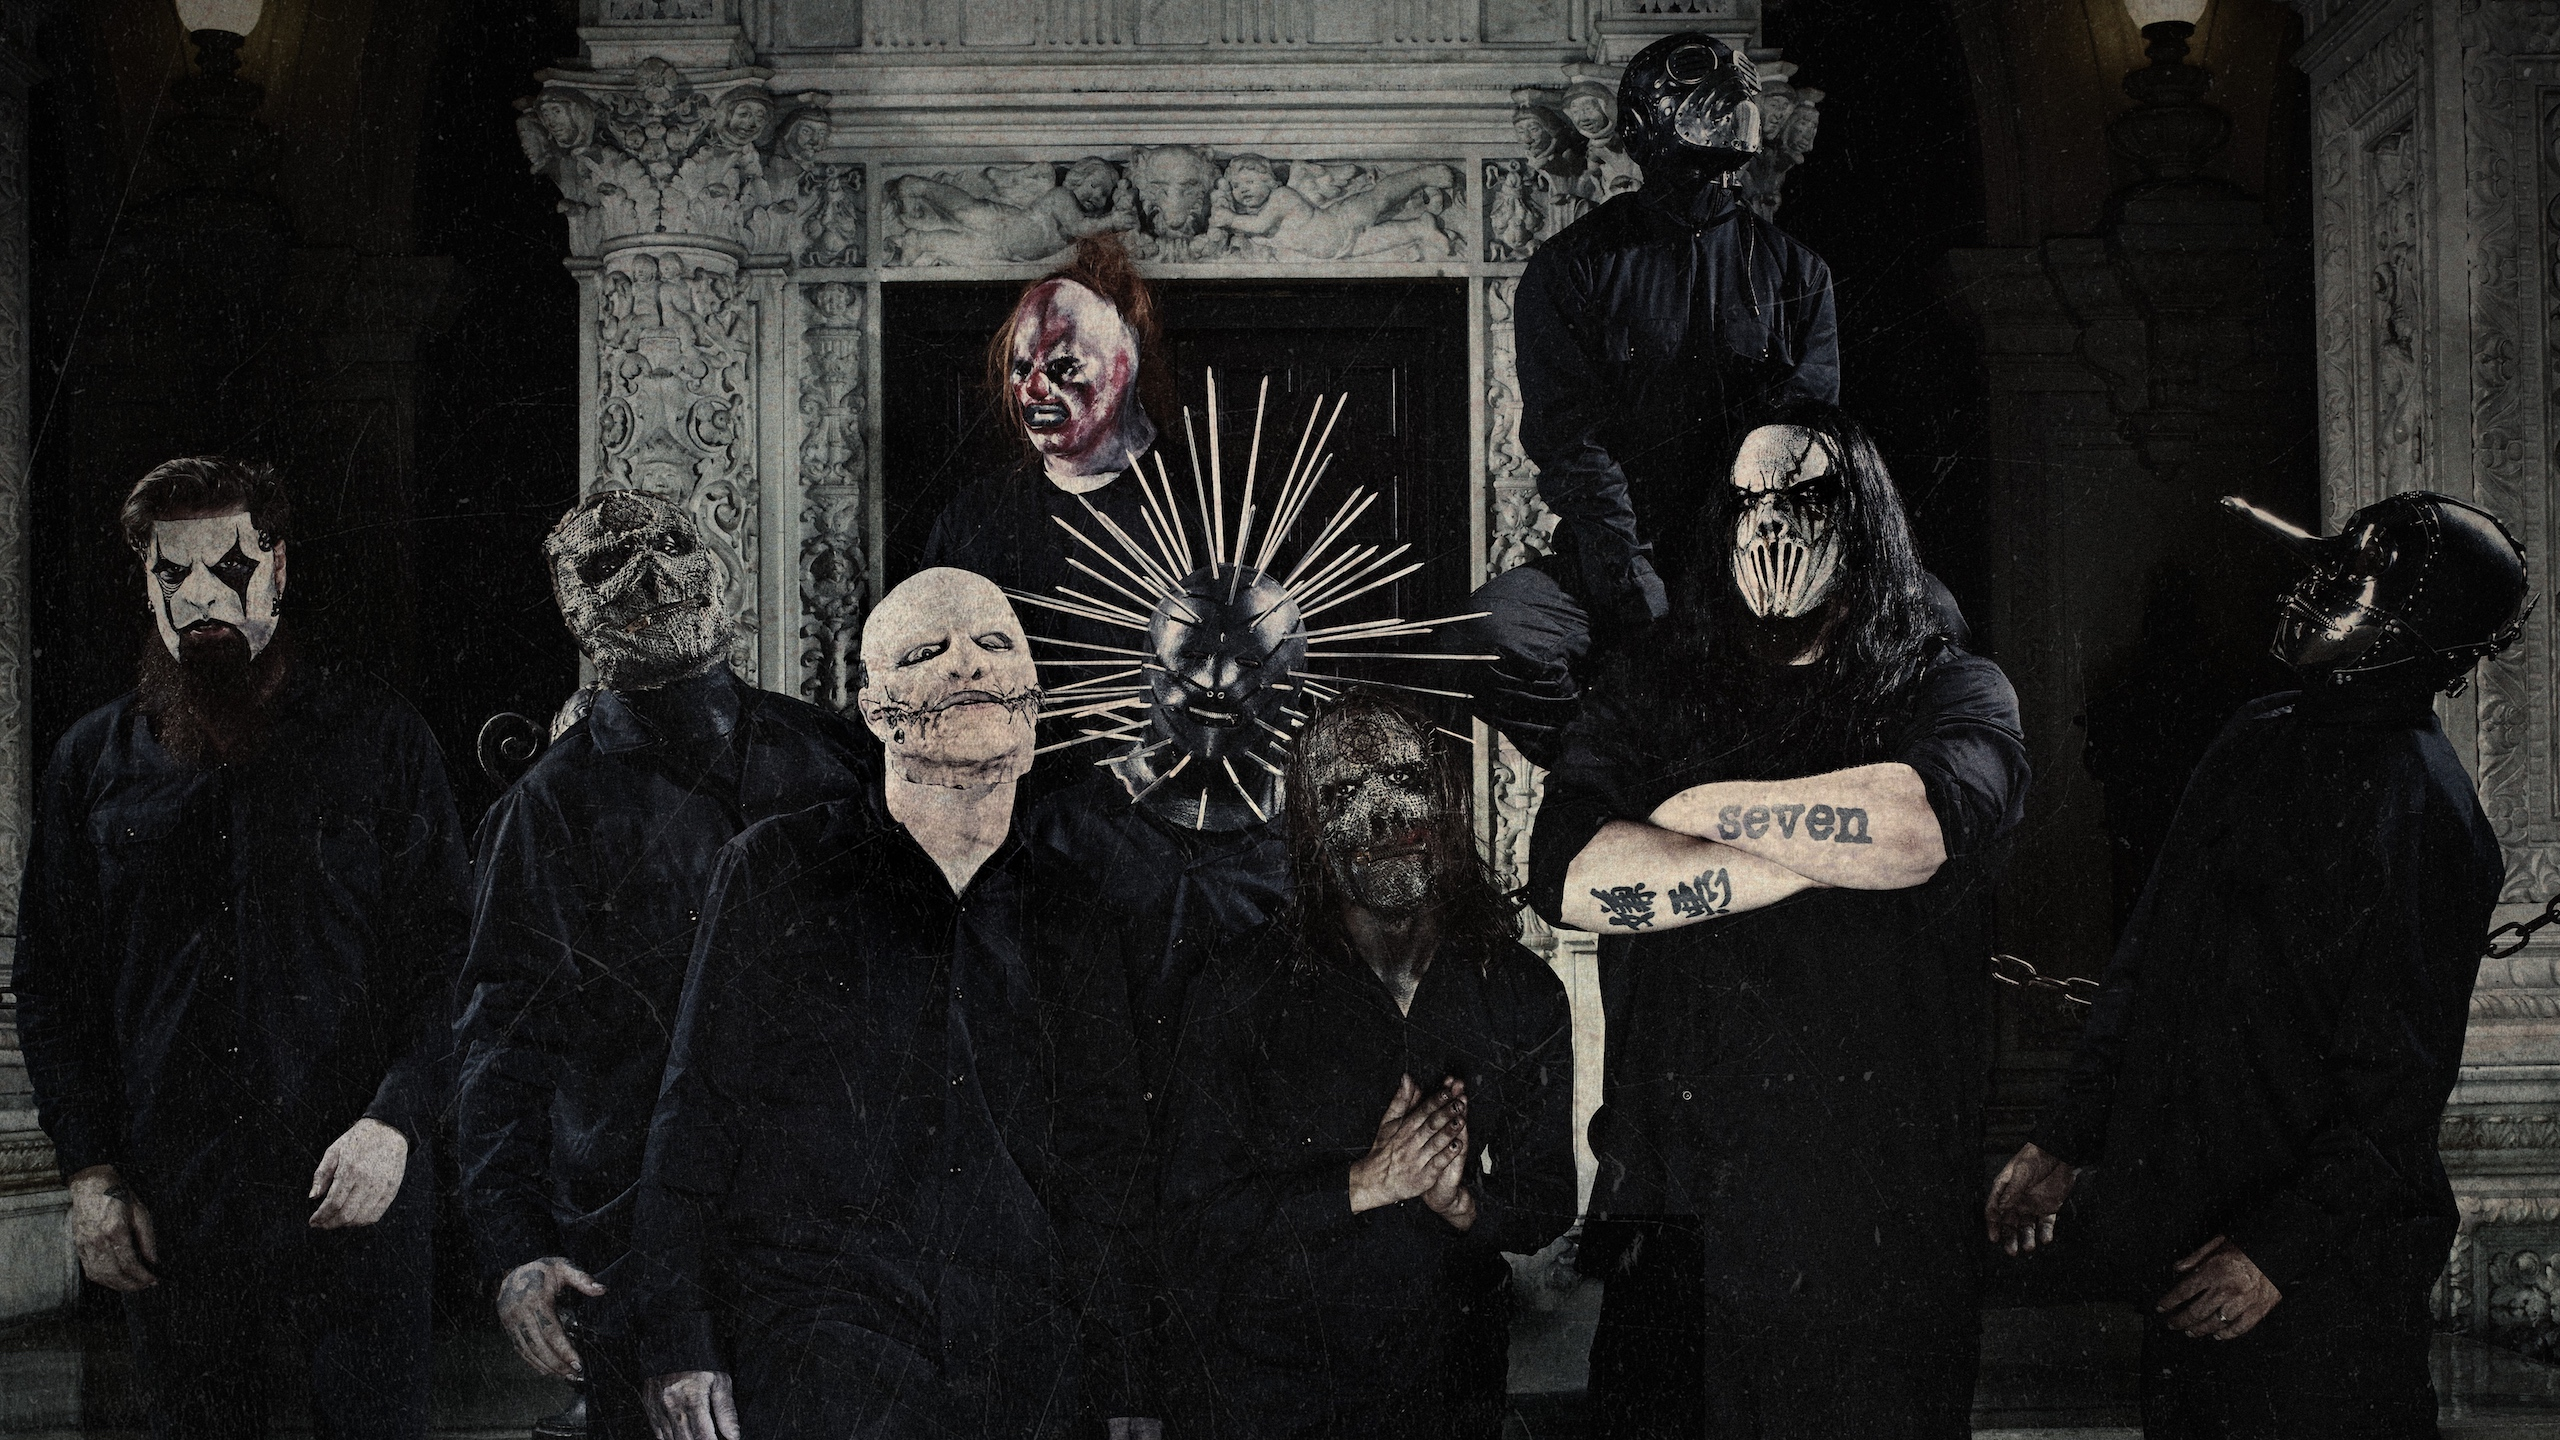 Slipknot Pics, Music Collection